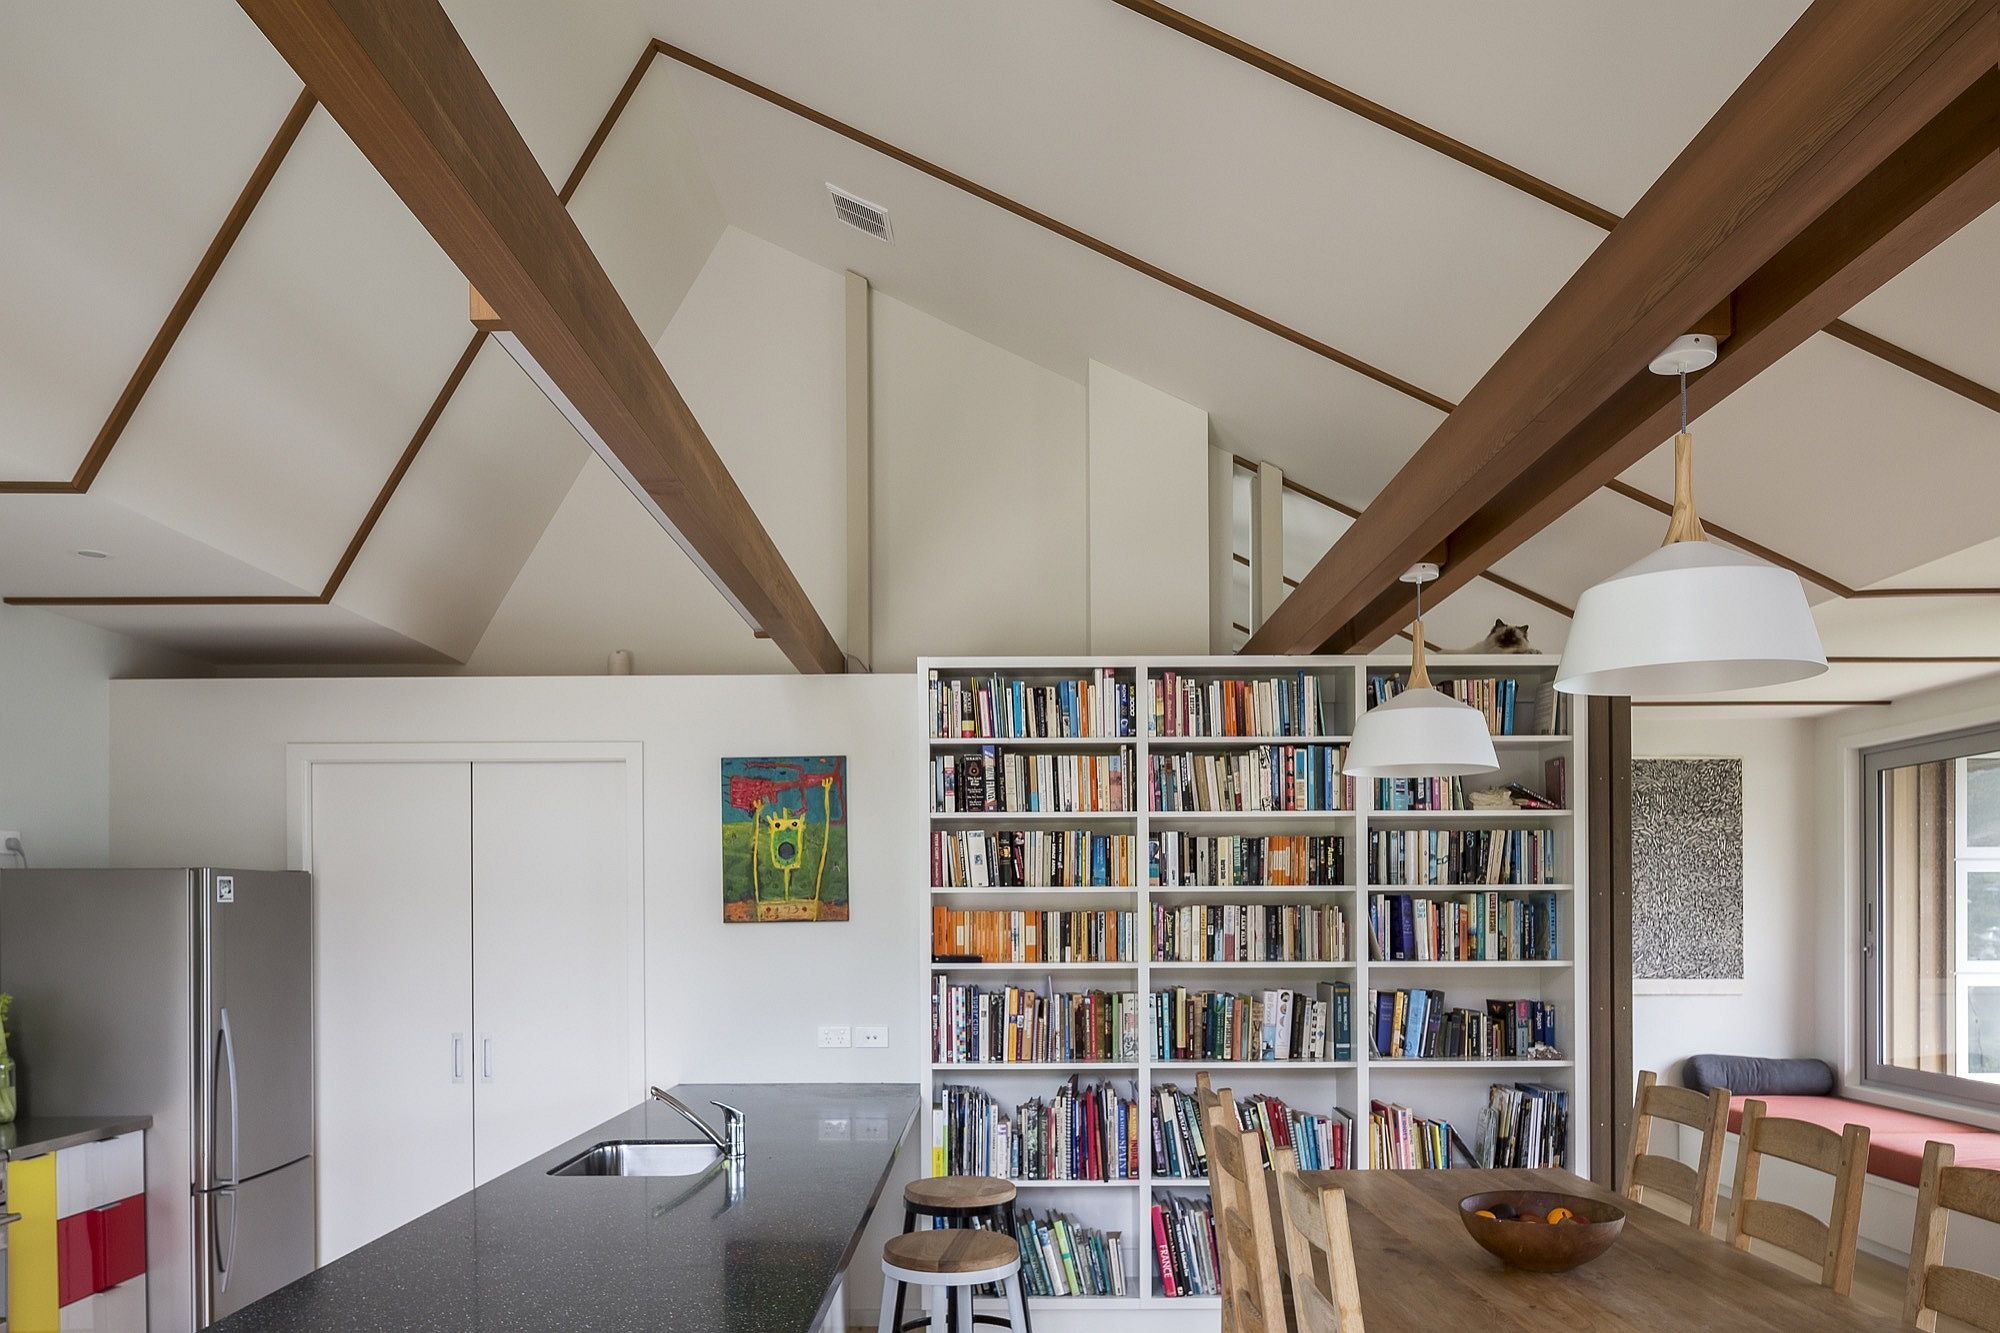 Bookshelf creates a cool backdrop in the modern kitchen